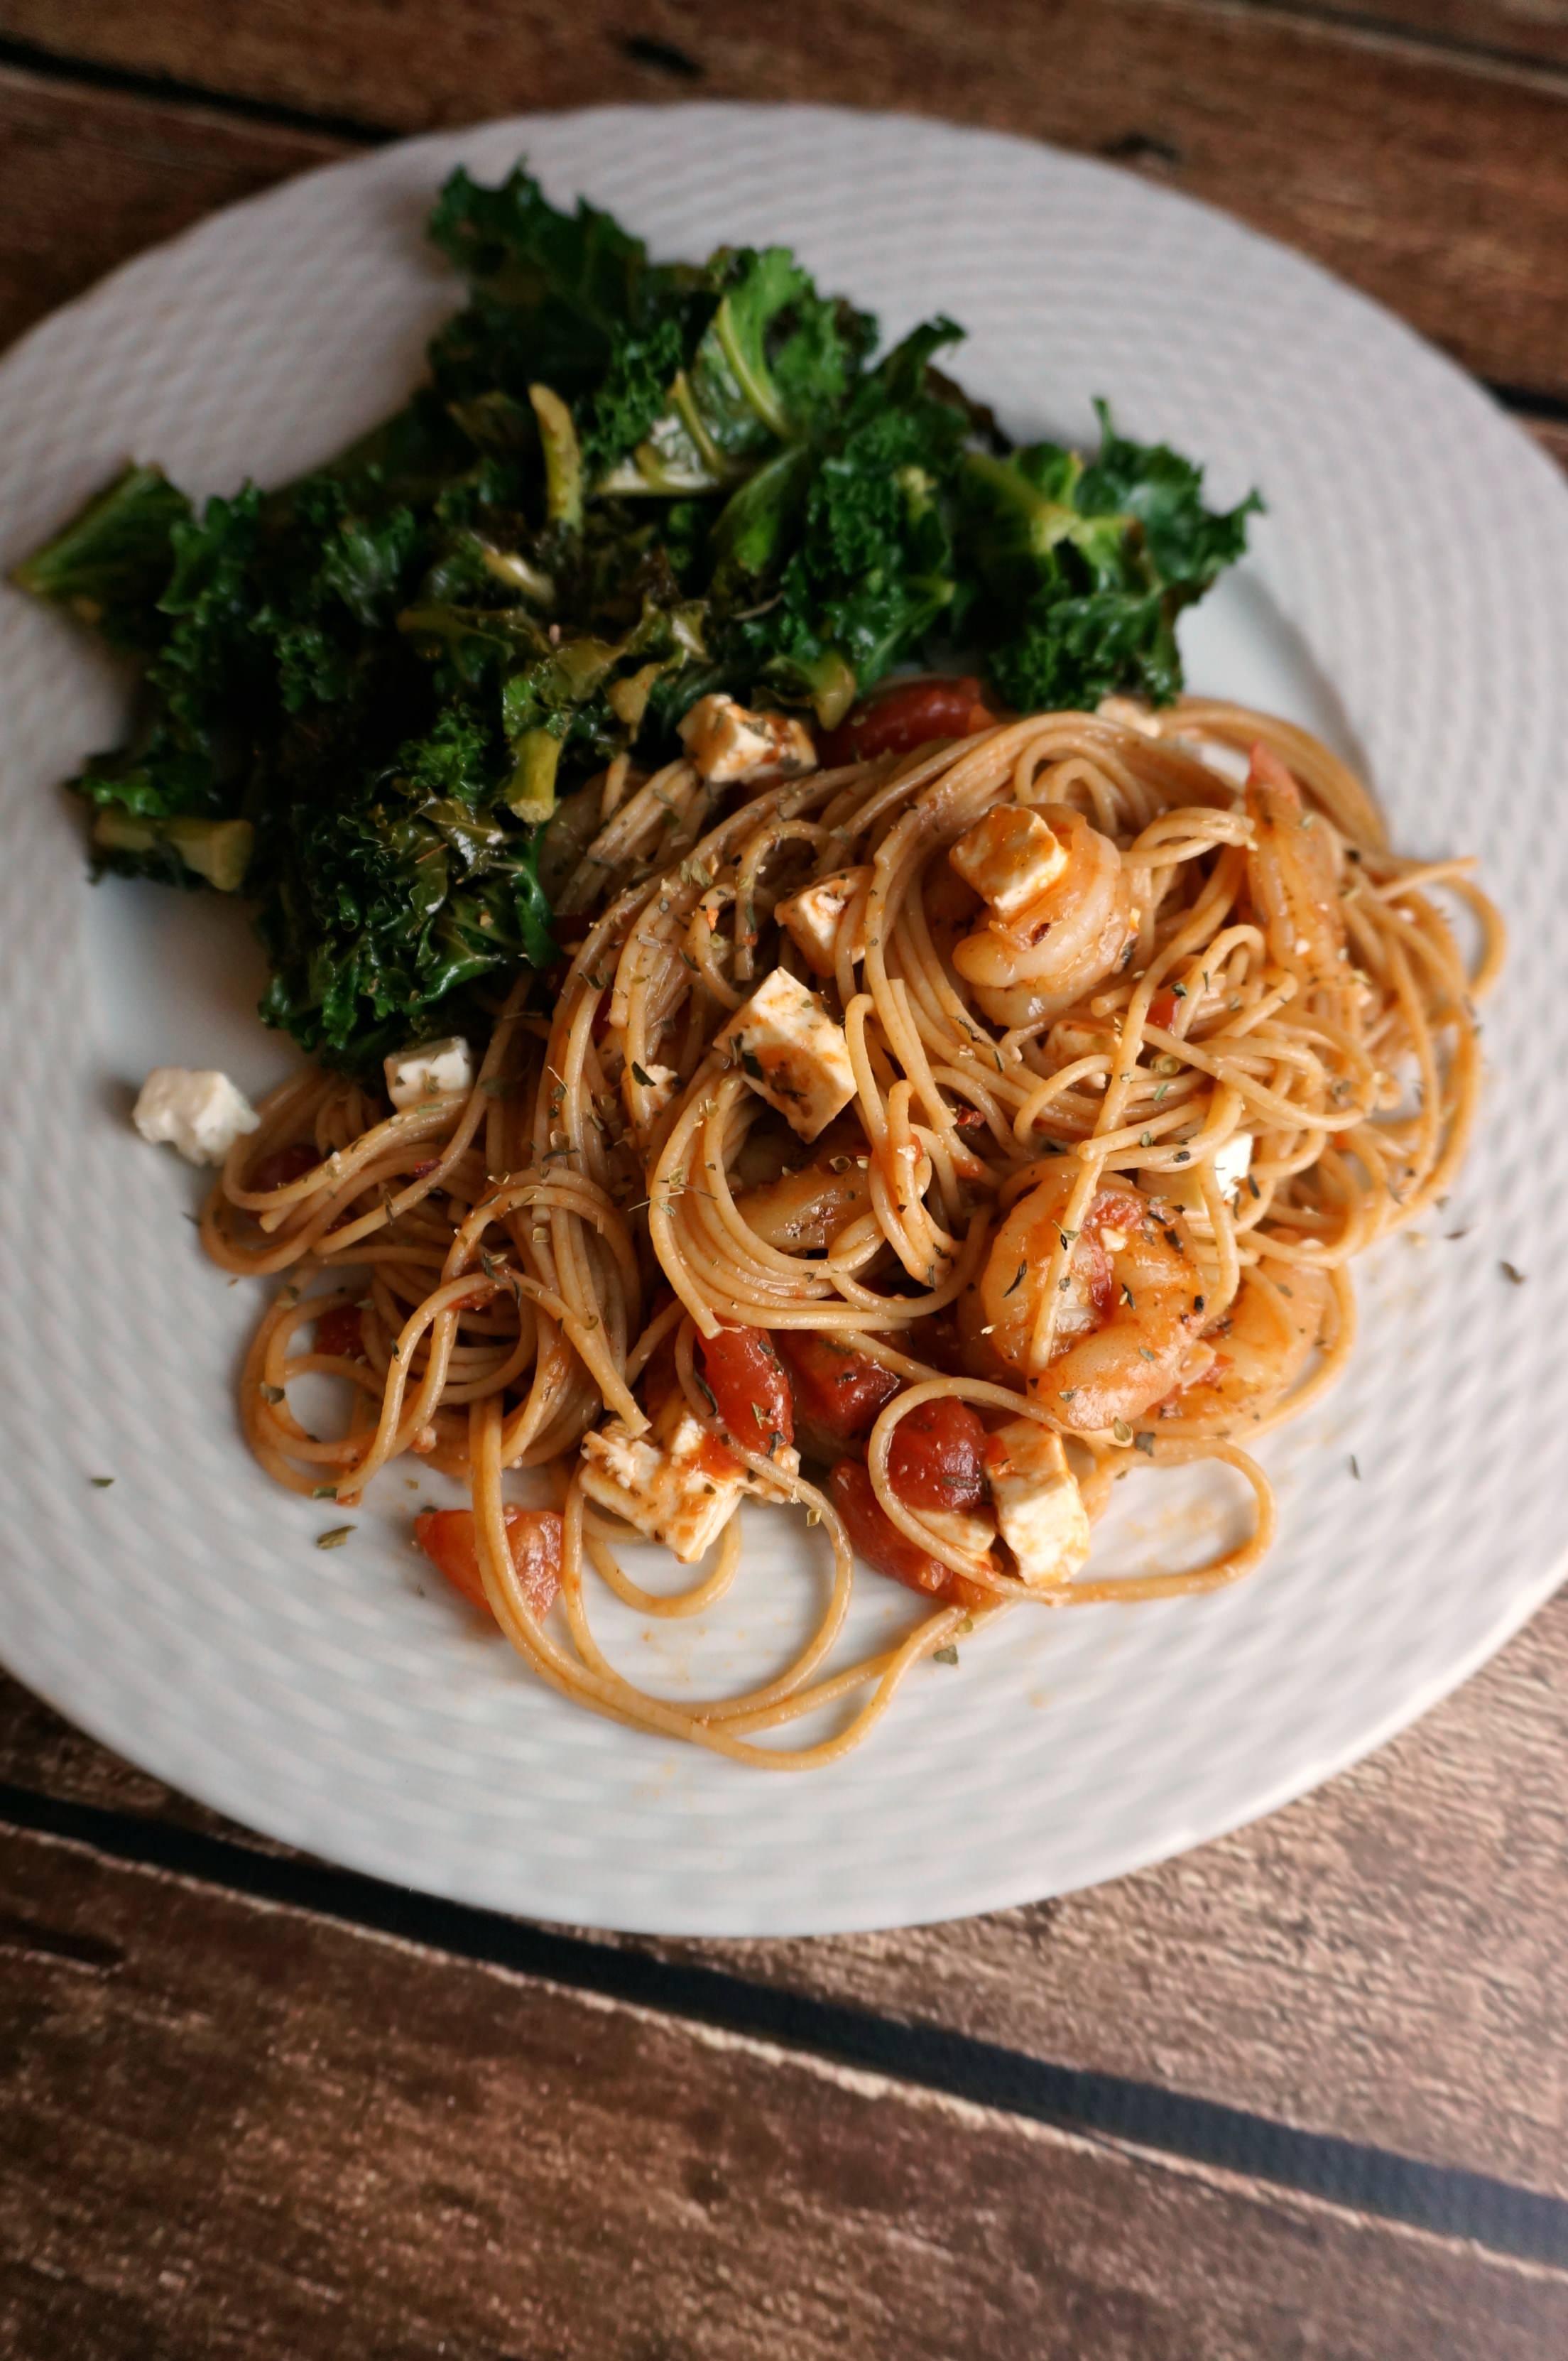 Greek recipes using pasta and shrimp